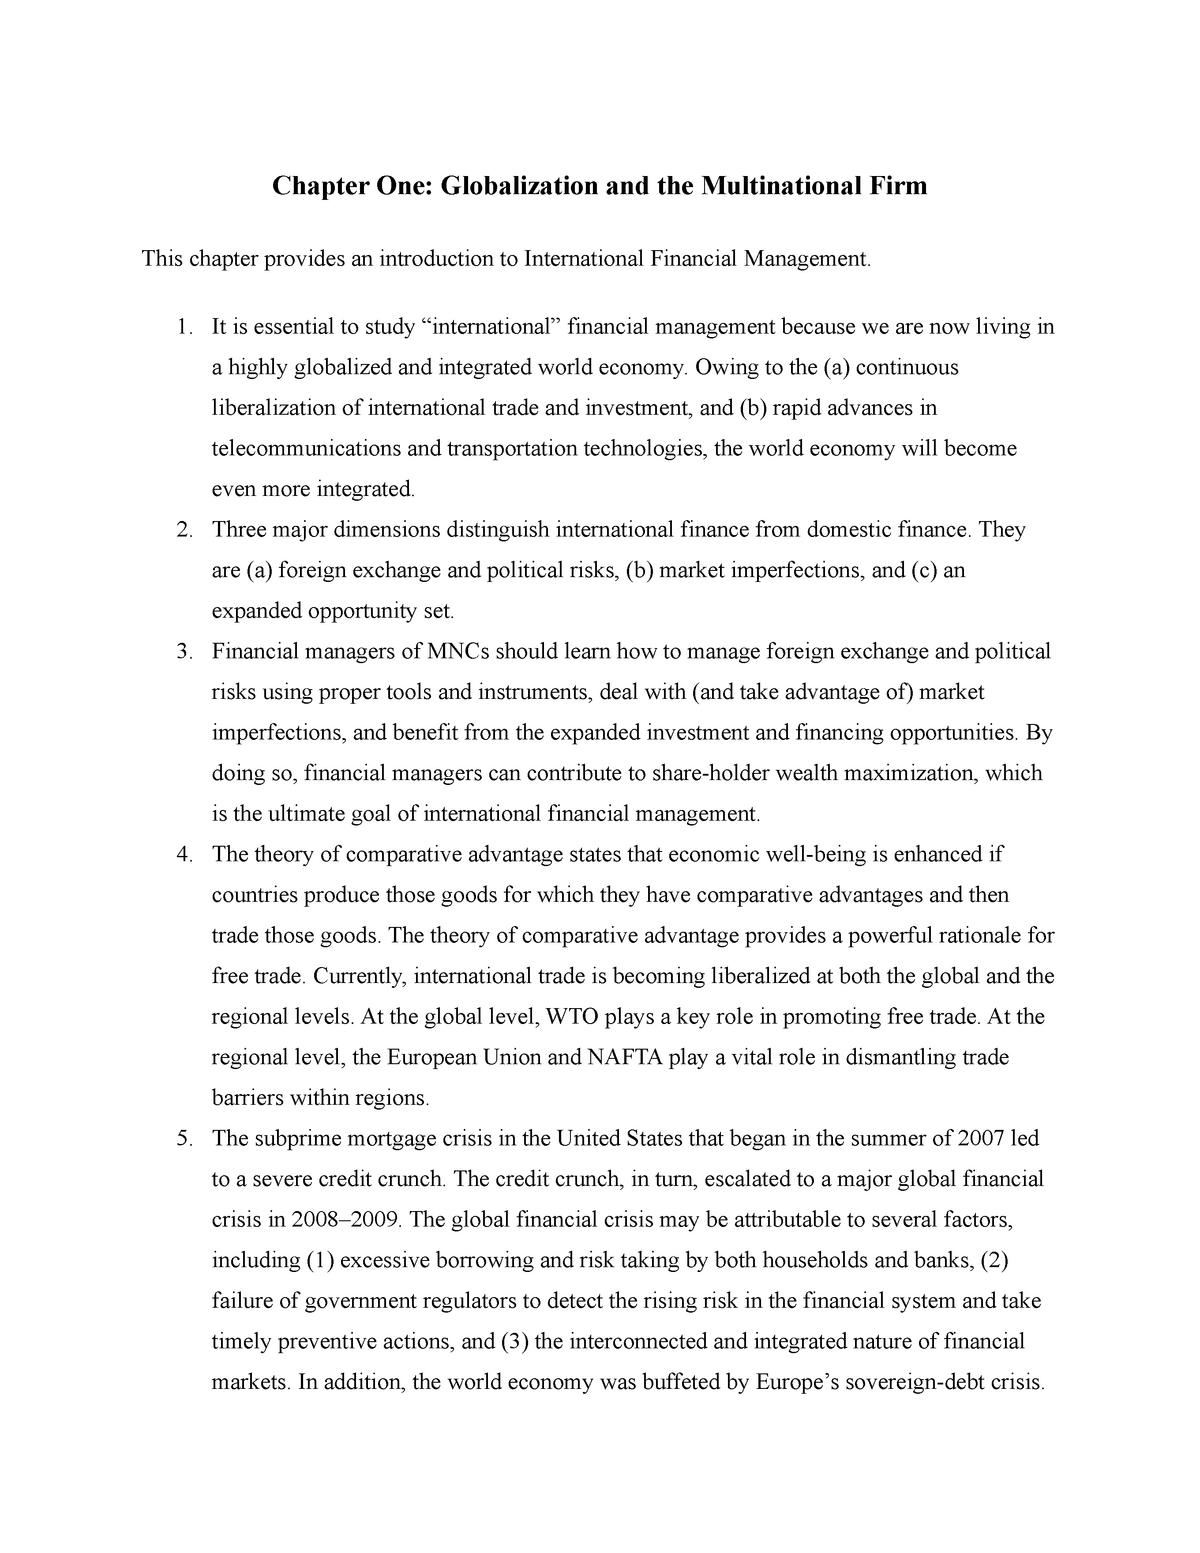 Chapter One - Intermediate macroeconomics - StuDocu